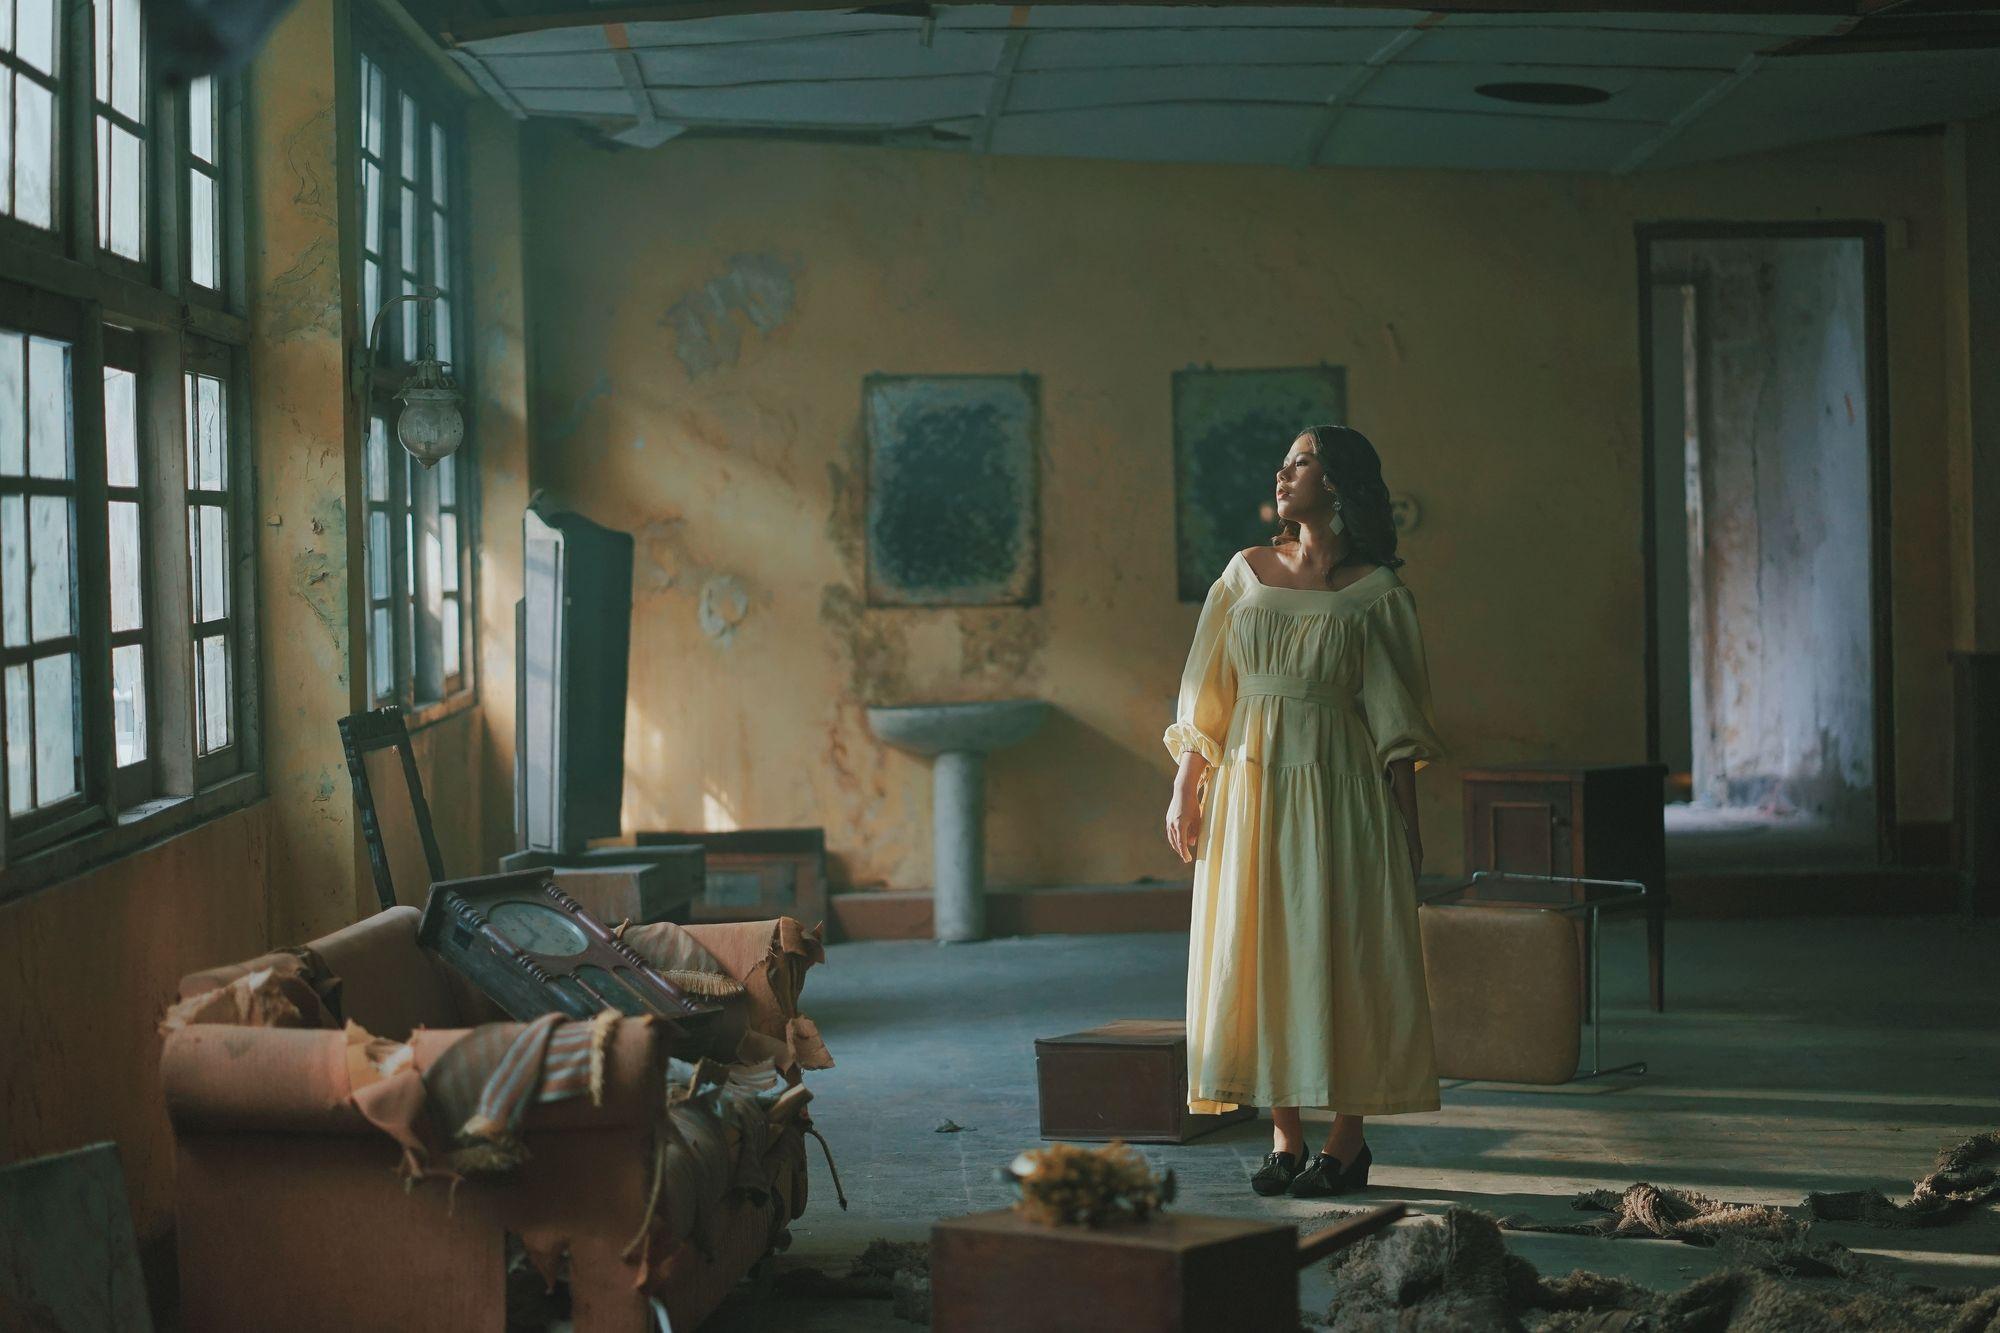 Artsy, conceptual music video still